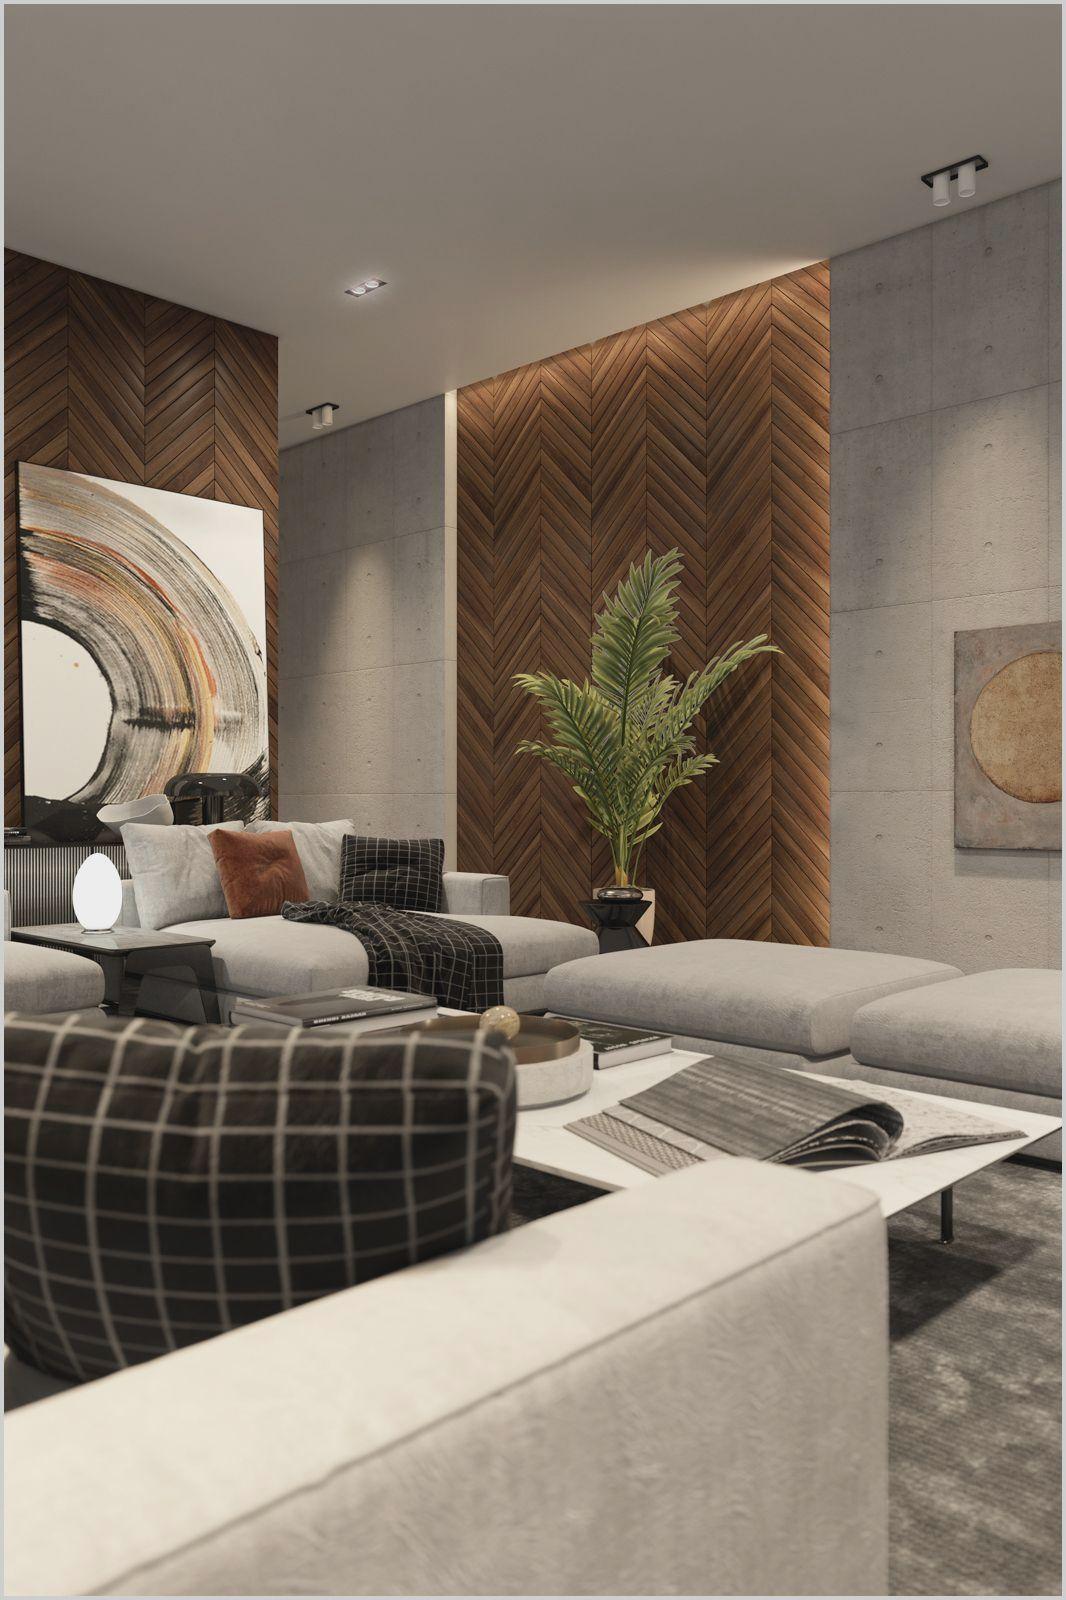 Modern Bedroom Wall Cladding Living Room Panelling Living Room Tiles Living Room Wall Designs